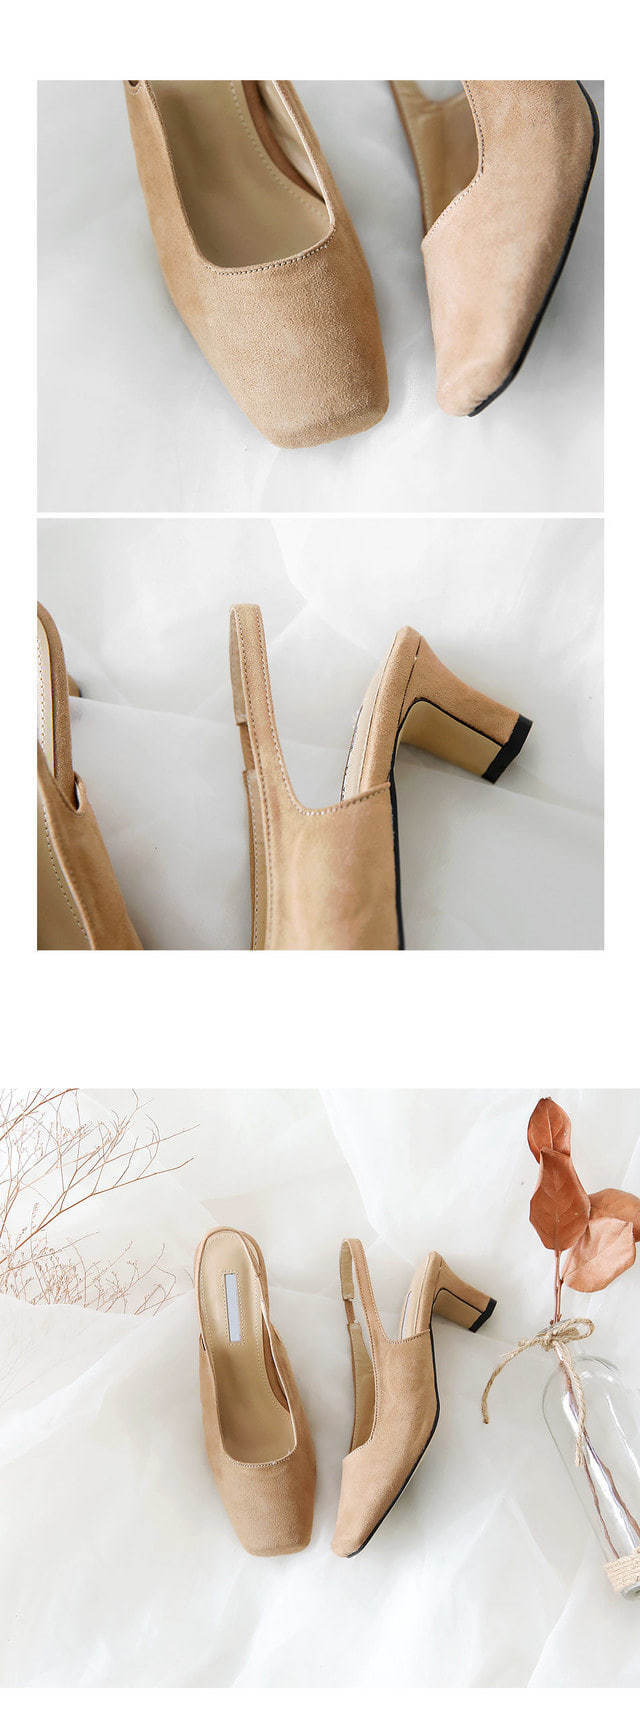 Kellin 's Slingback Middle Heel Pumps 5cm